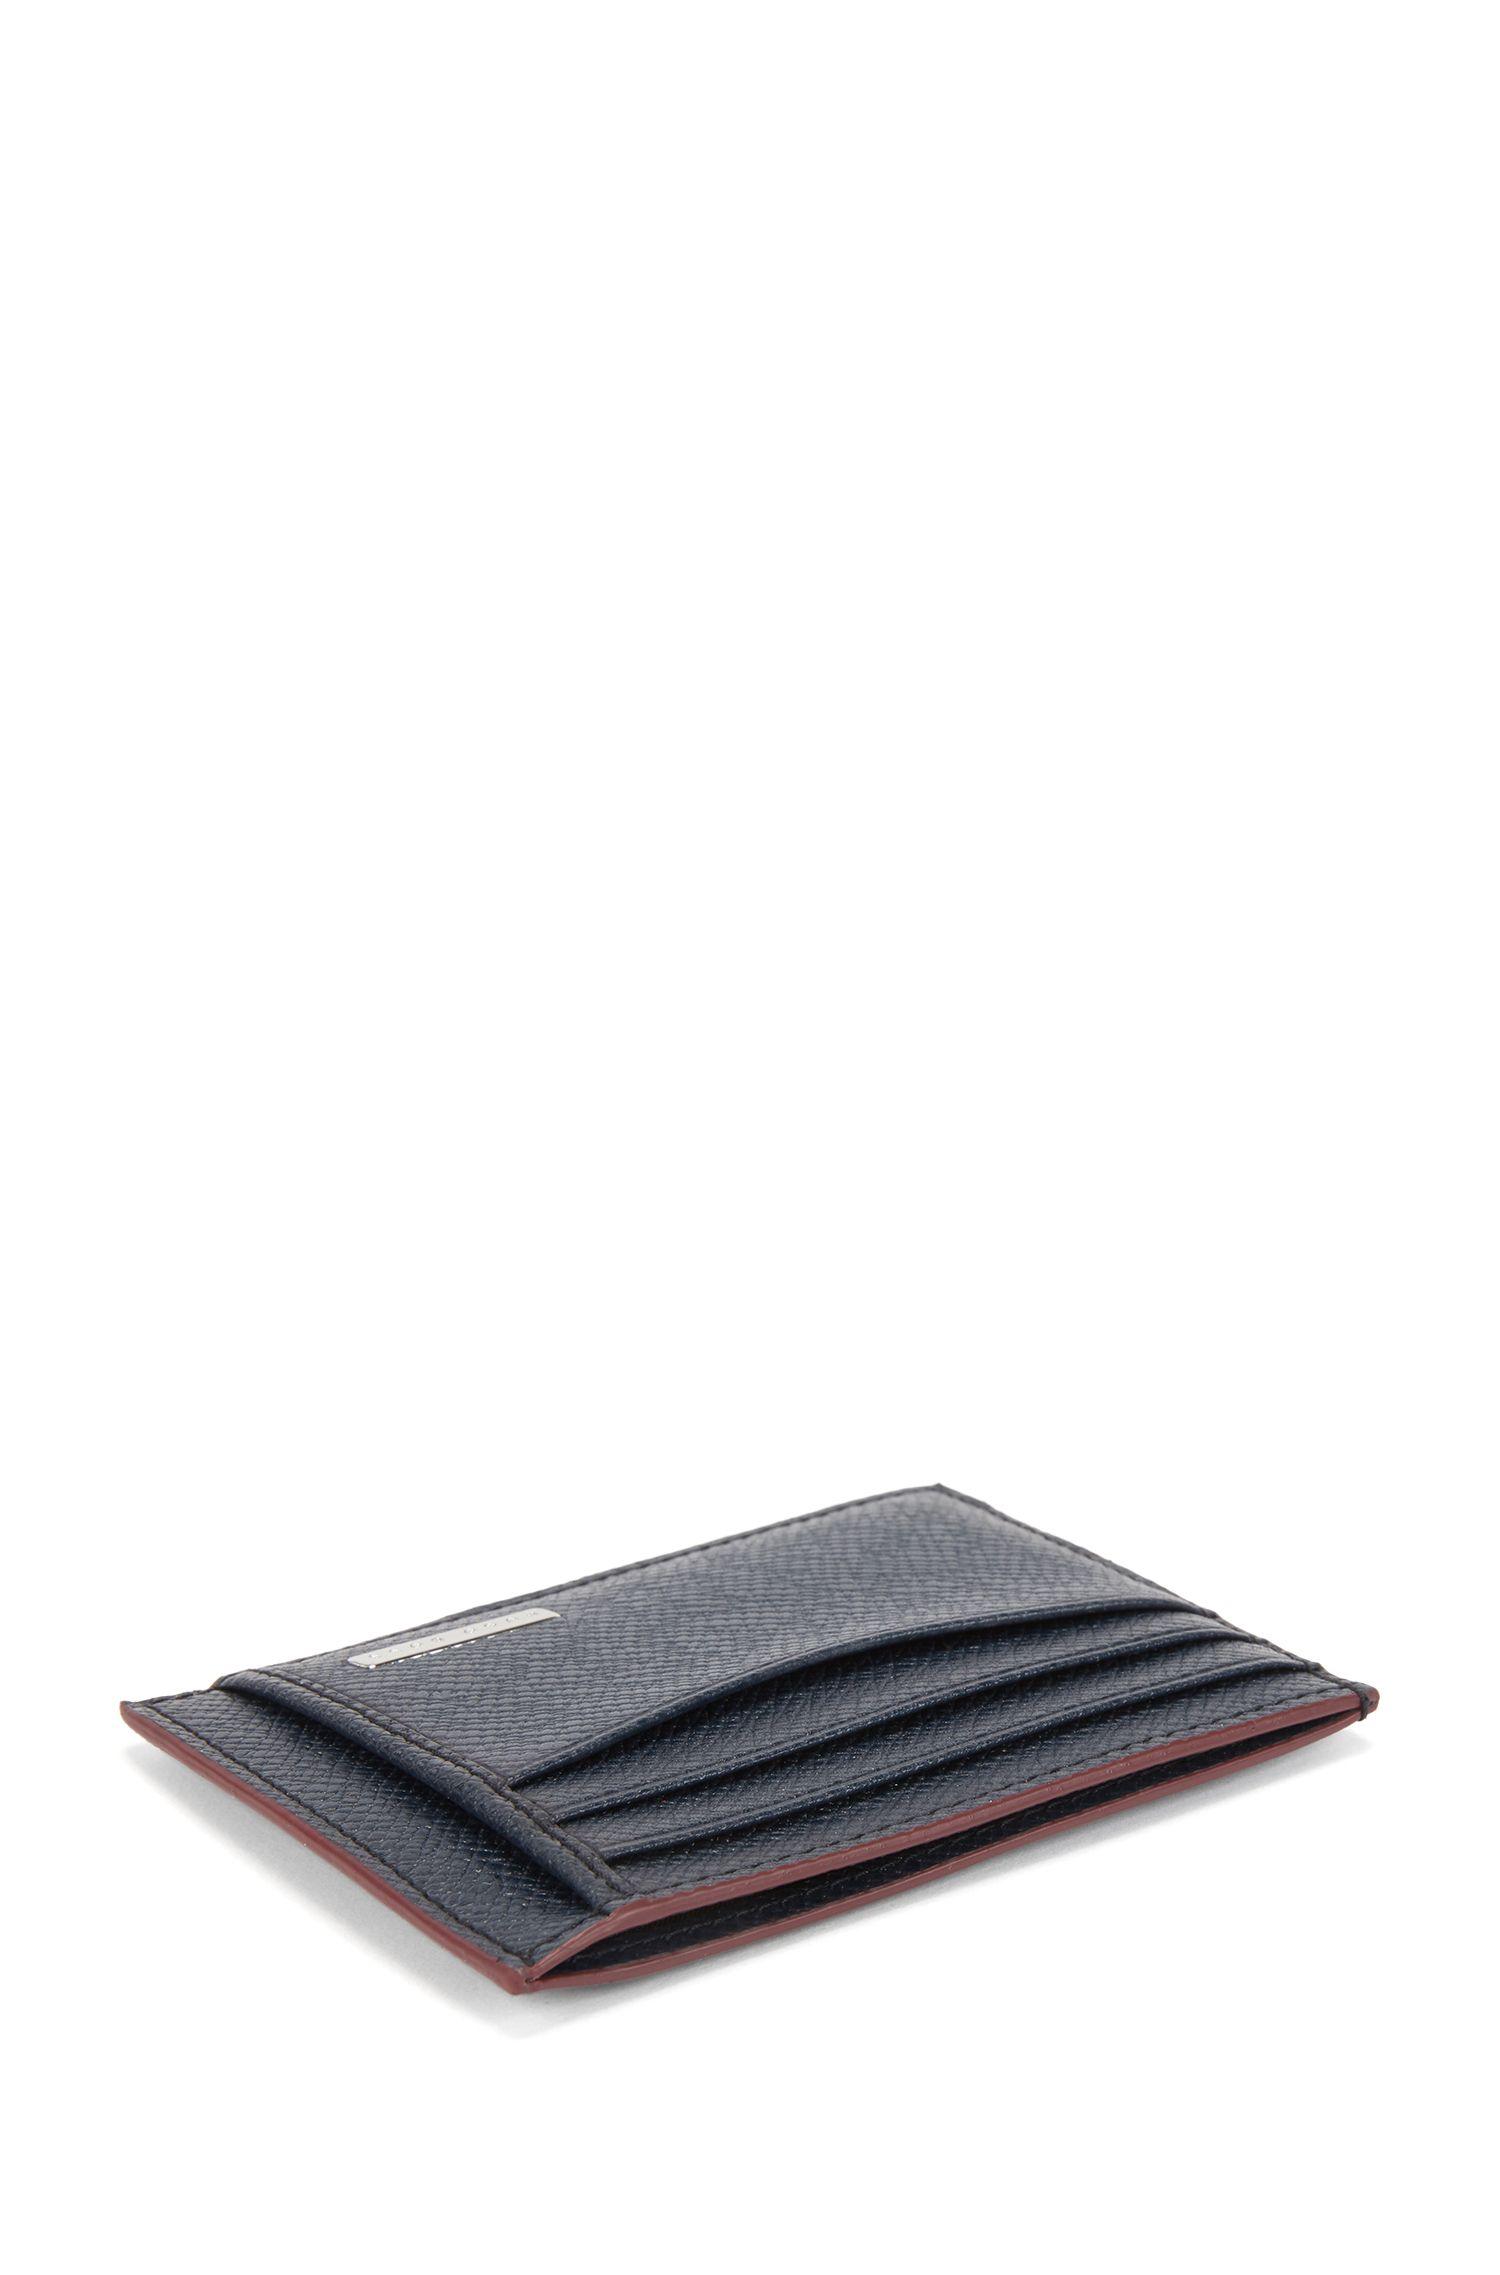 Kartenetui aus Palmellato-Leder aus der Signature Collection, Dunkelblau